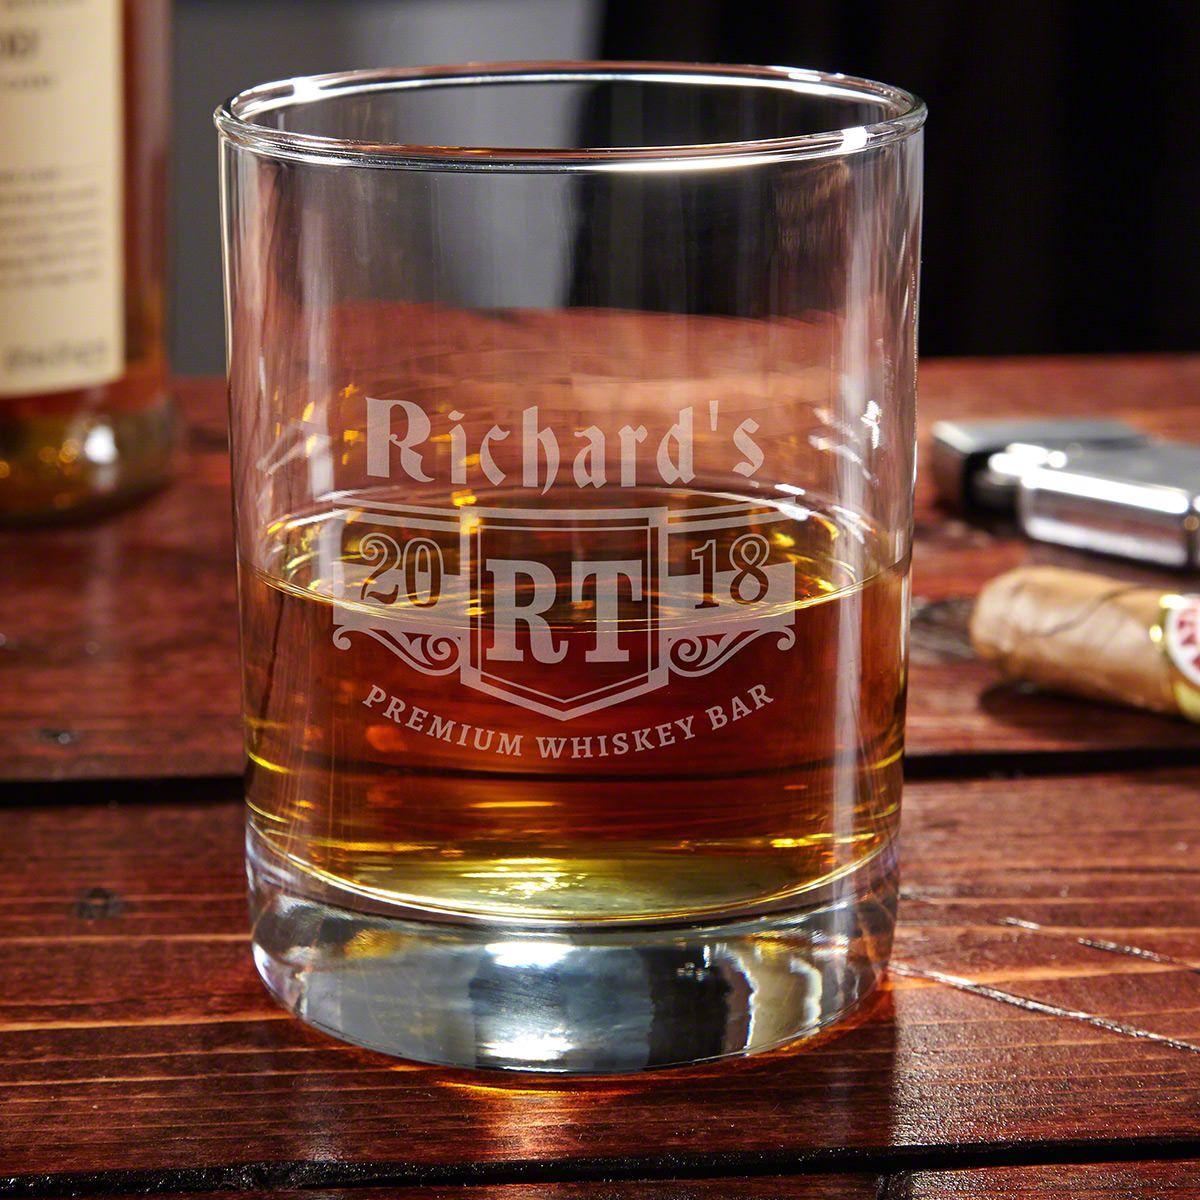 Bedingfeld Monogram Personalized Whiskey Glass